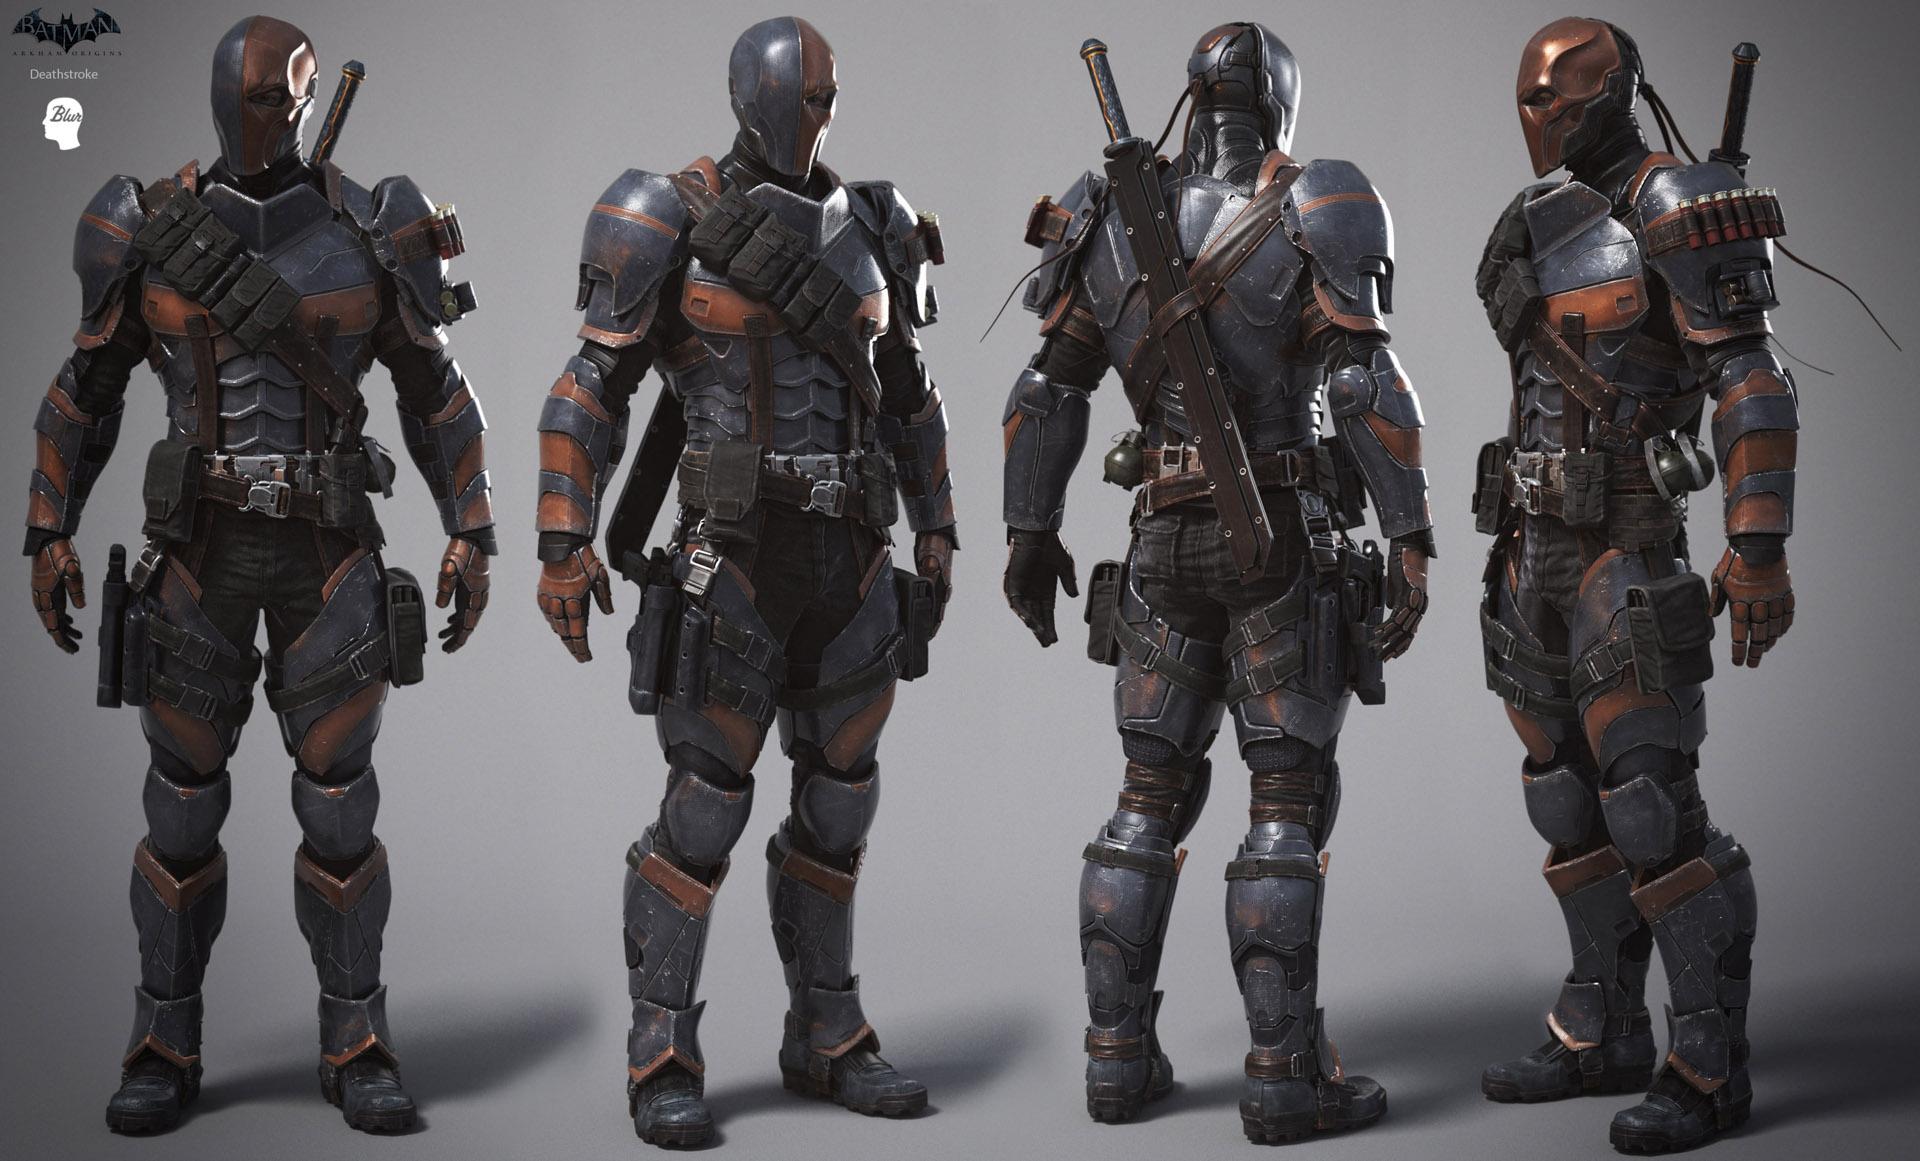 Lead character artist alessandro baldasseroni for Deathstroke armor template